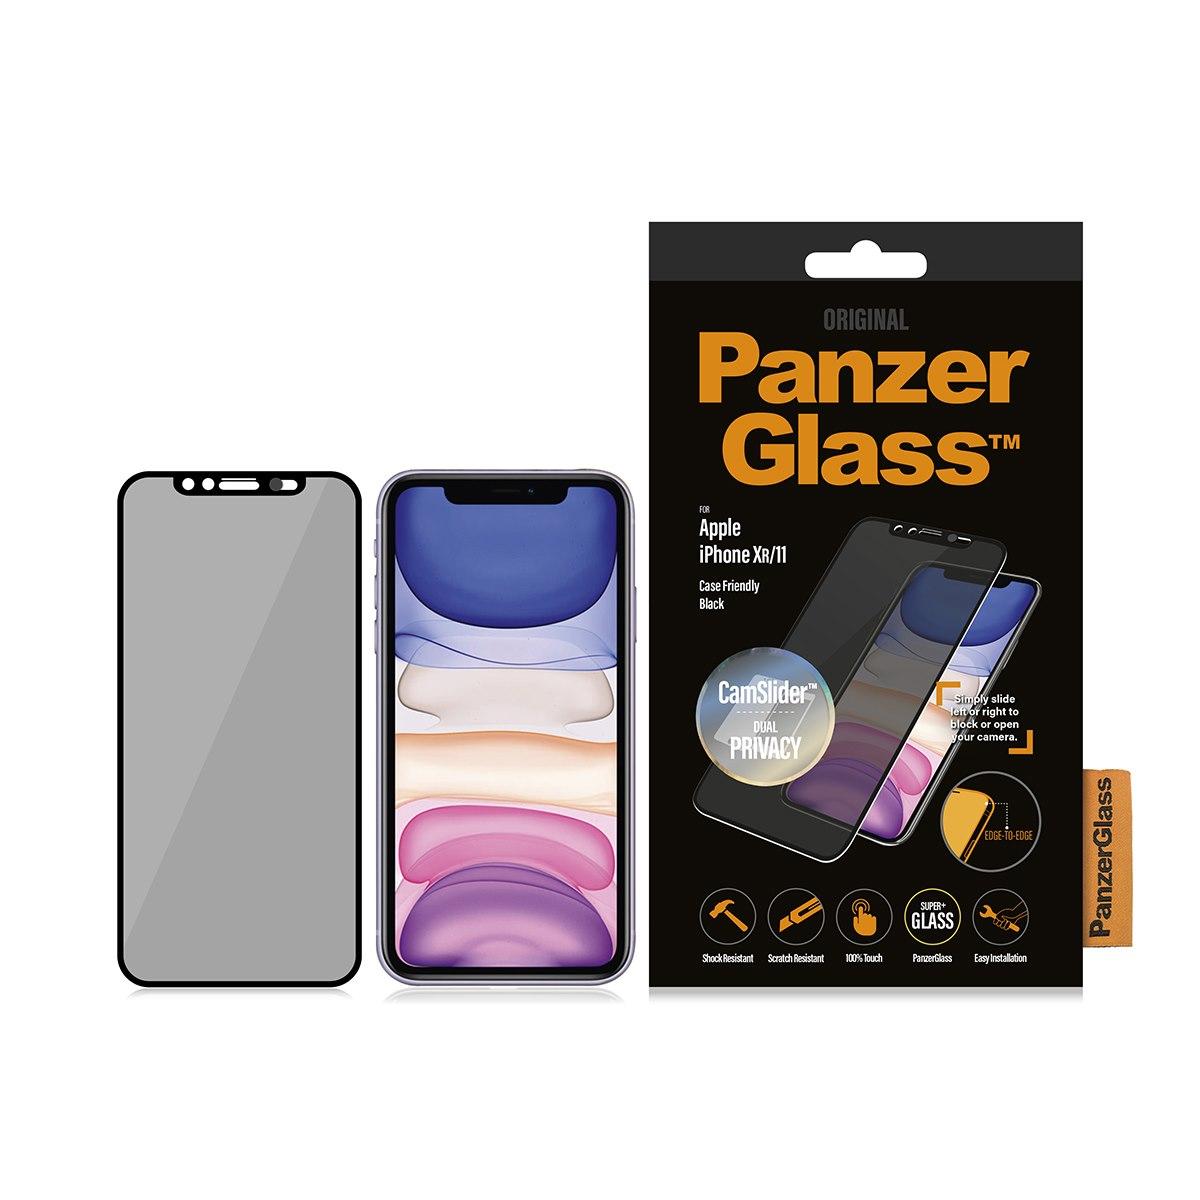 PanzerGlass Original Tempered Glass Screen Protector - Black